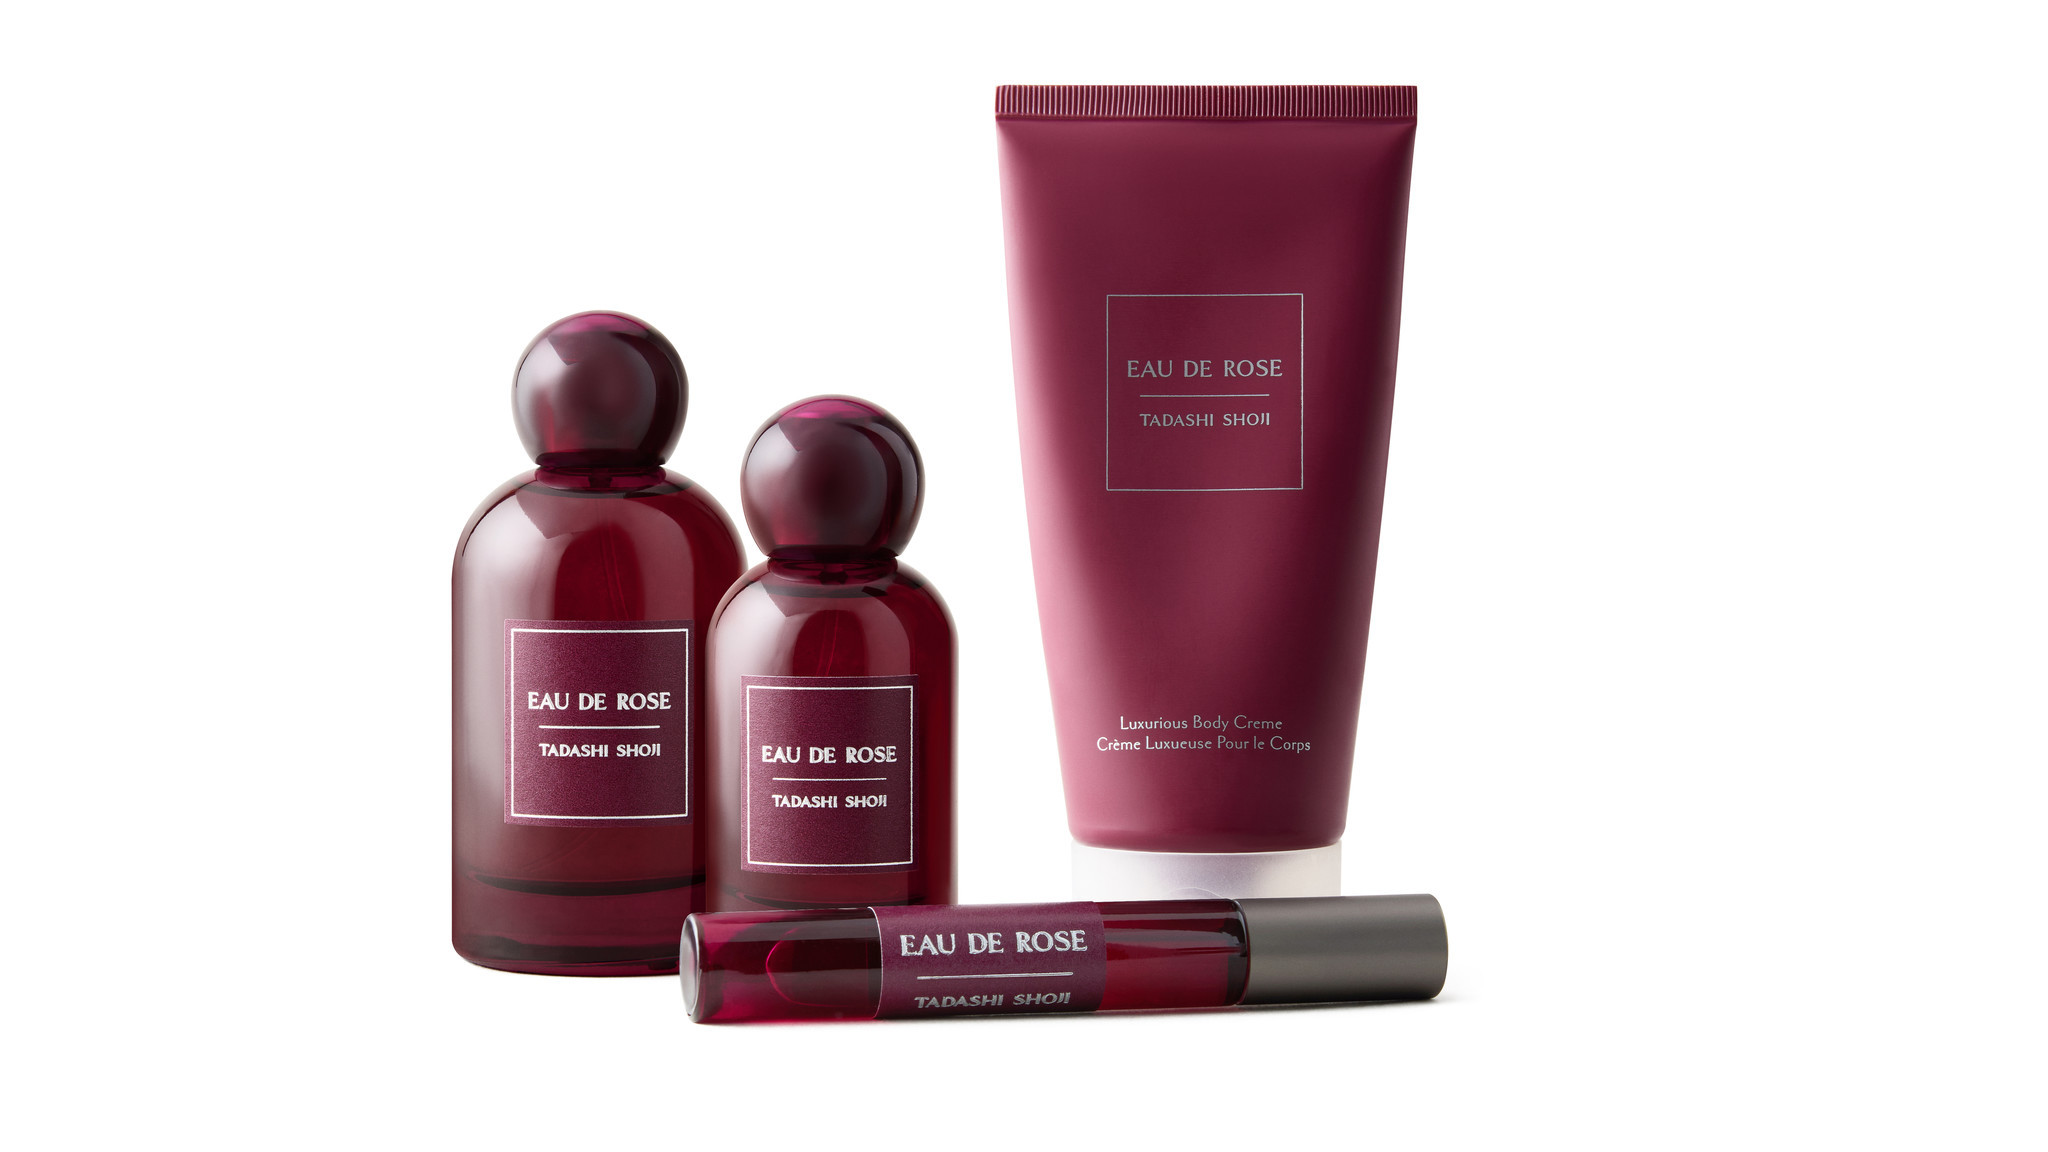 Tadashi Shoji recently introduced a signature Eau de Rose parfum, $135 for 3.4 oz., $110 for 1.7 oz., $27 for .34 oz. rollerball and $55 for 5.1 oz. body creme. The beauty products are available at tadashishoji.com.